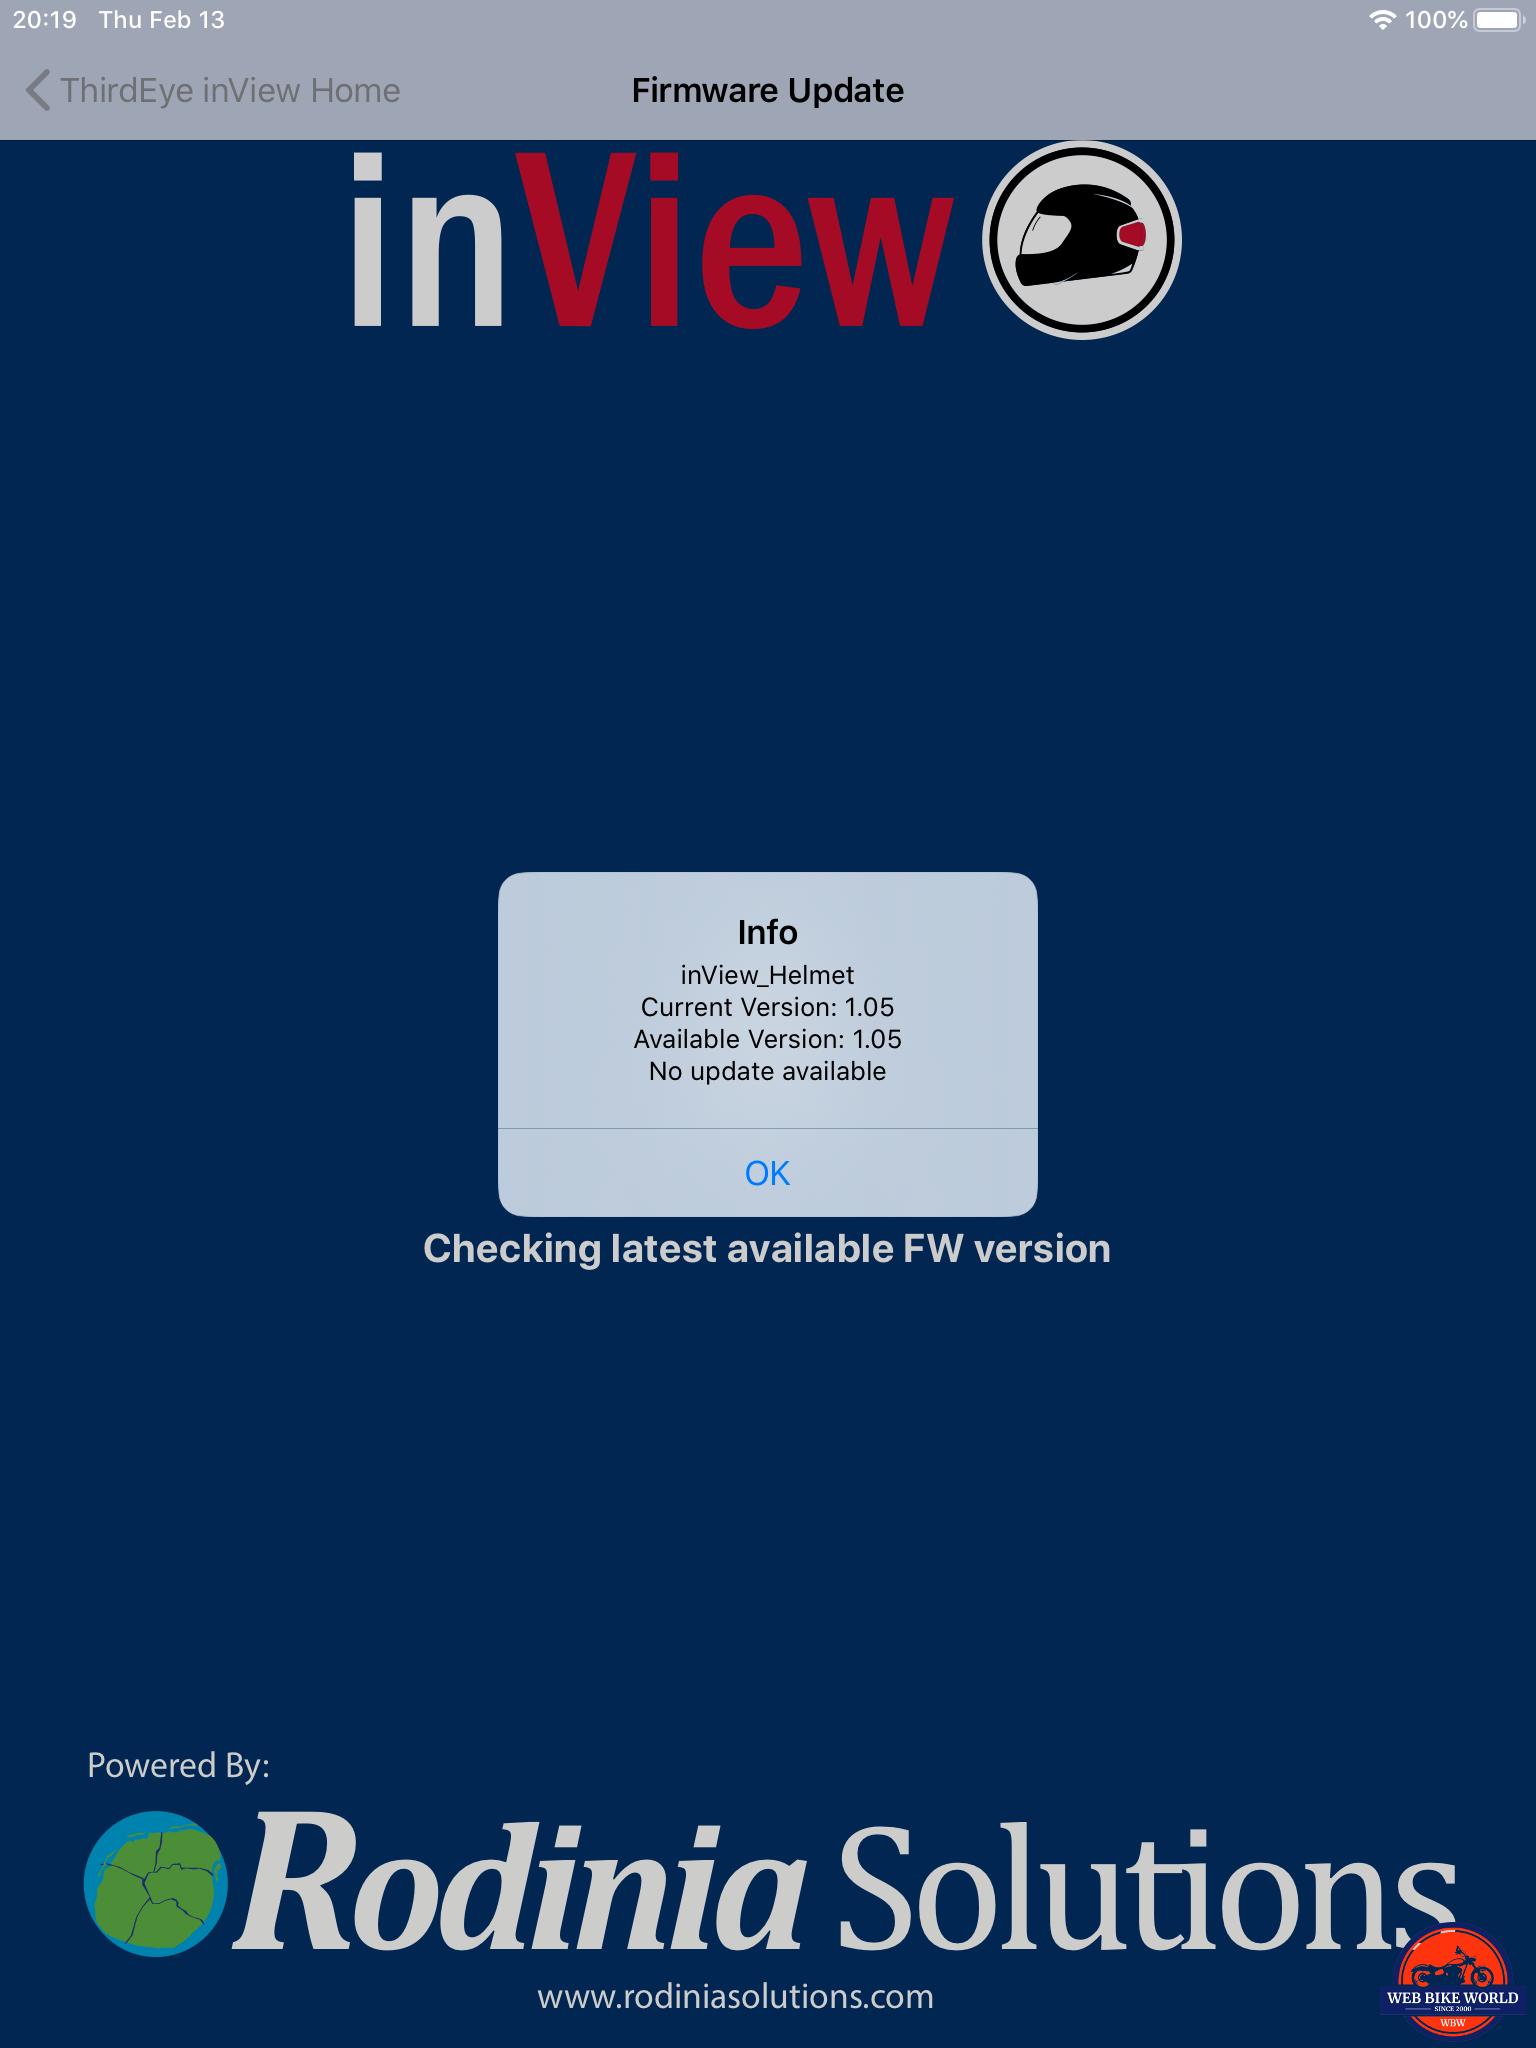 inView, App Screenshot, 4 of 7, firmware update screen